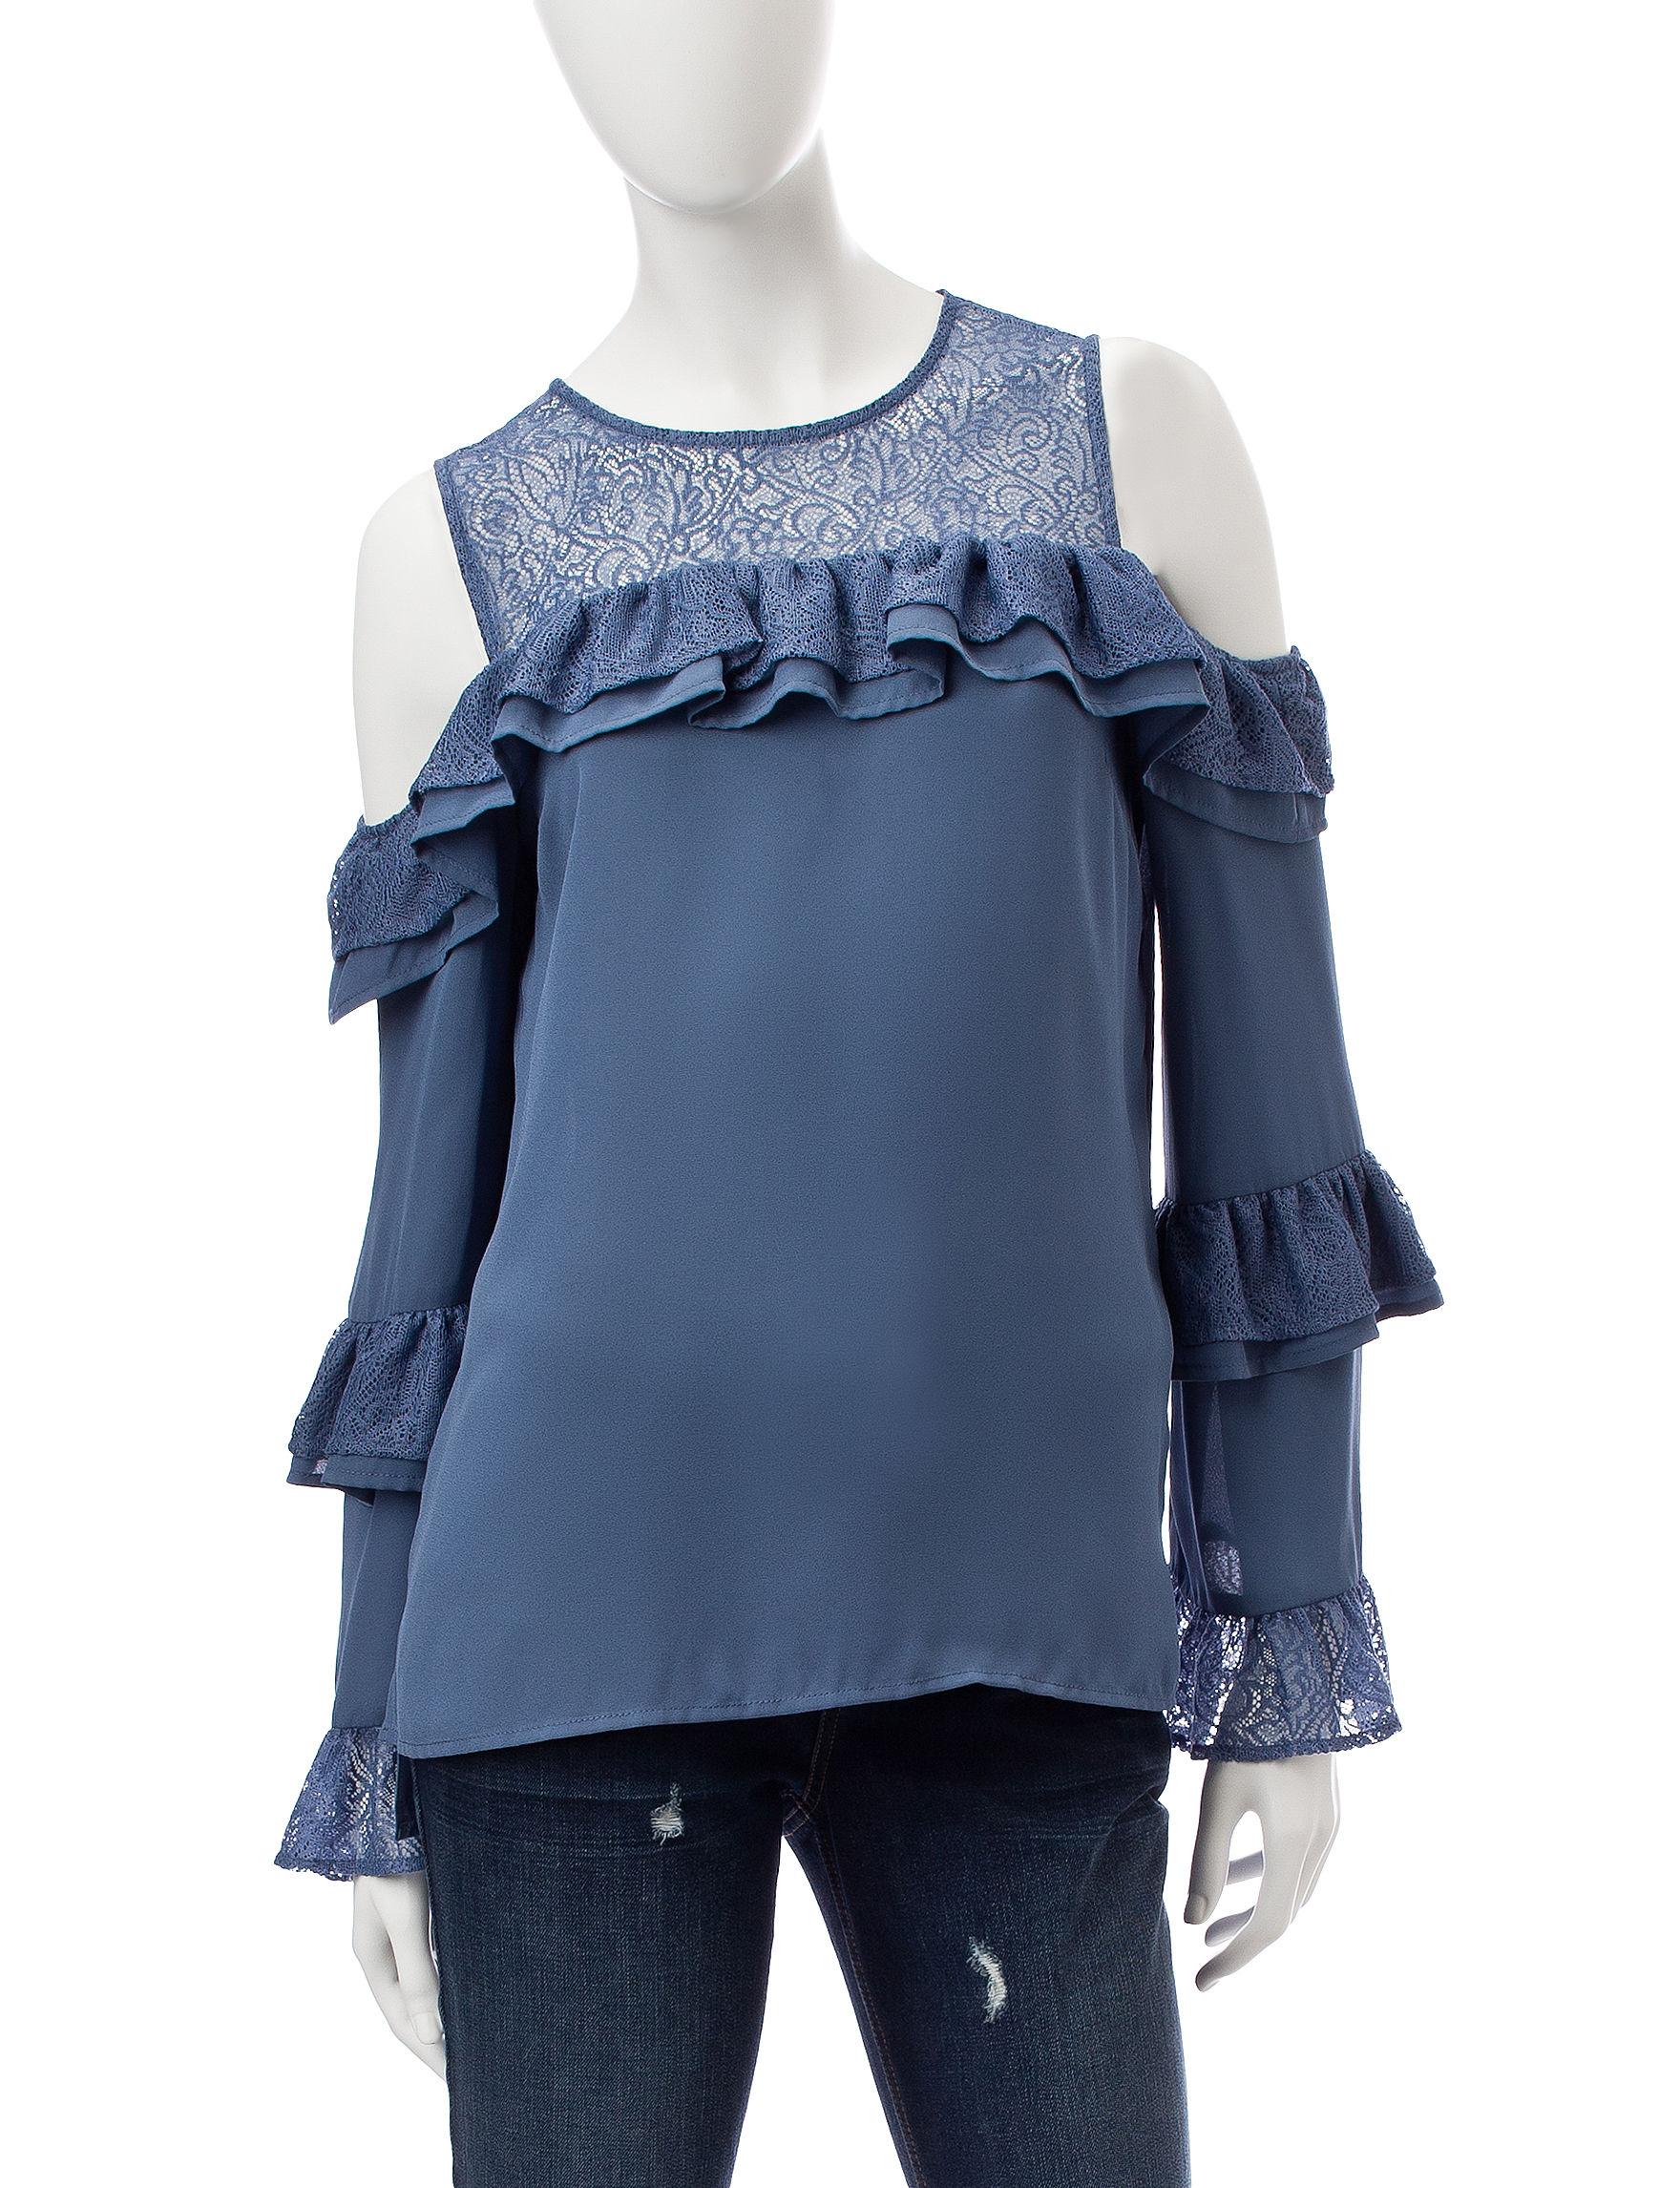 Signature Studio Blue Shirts & Blouses